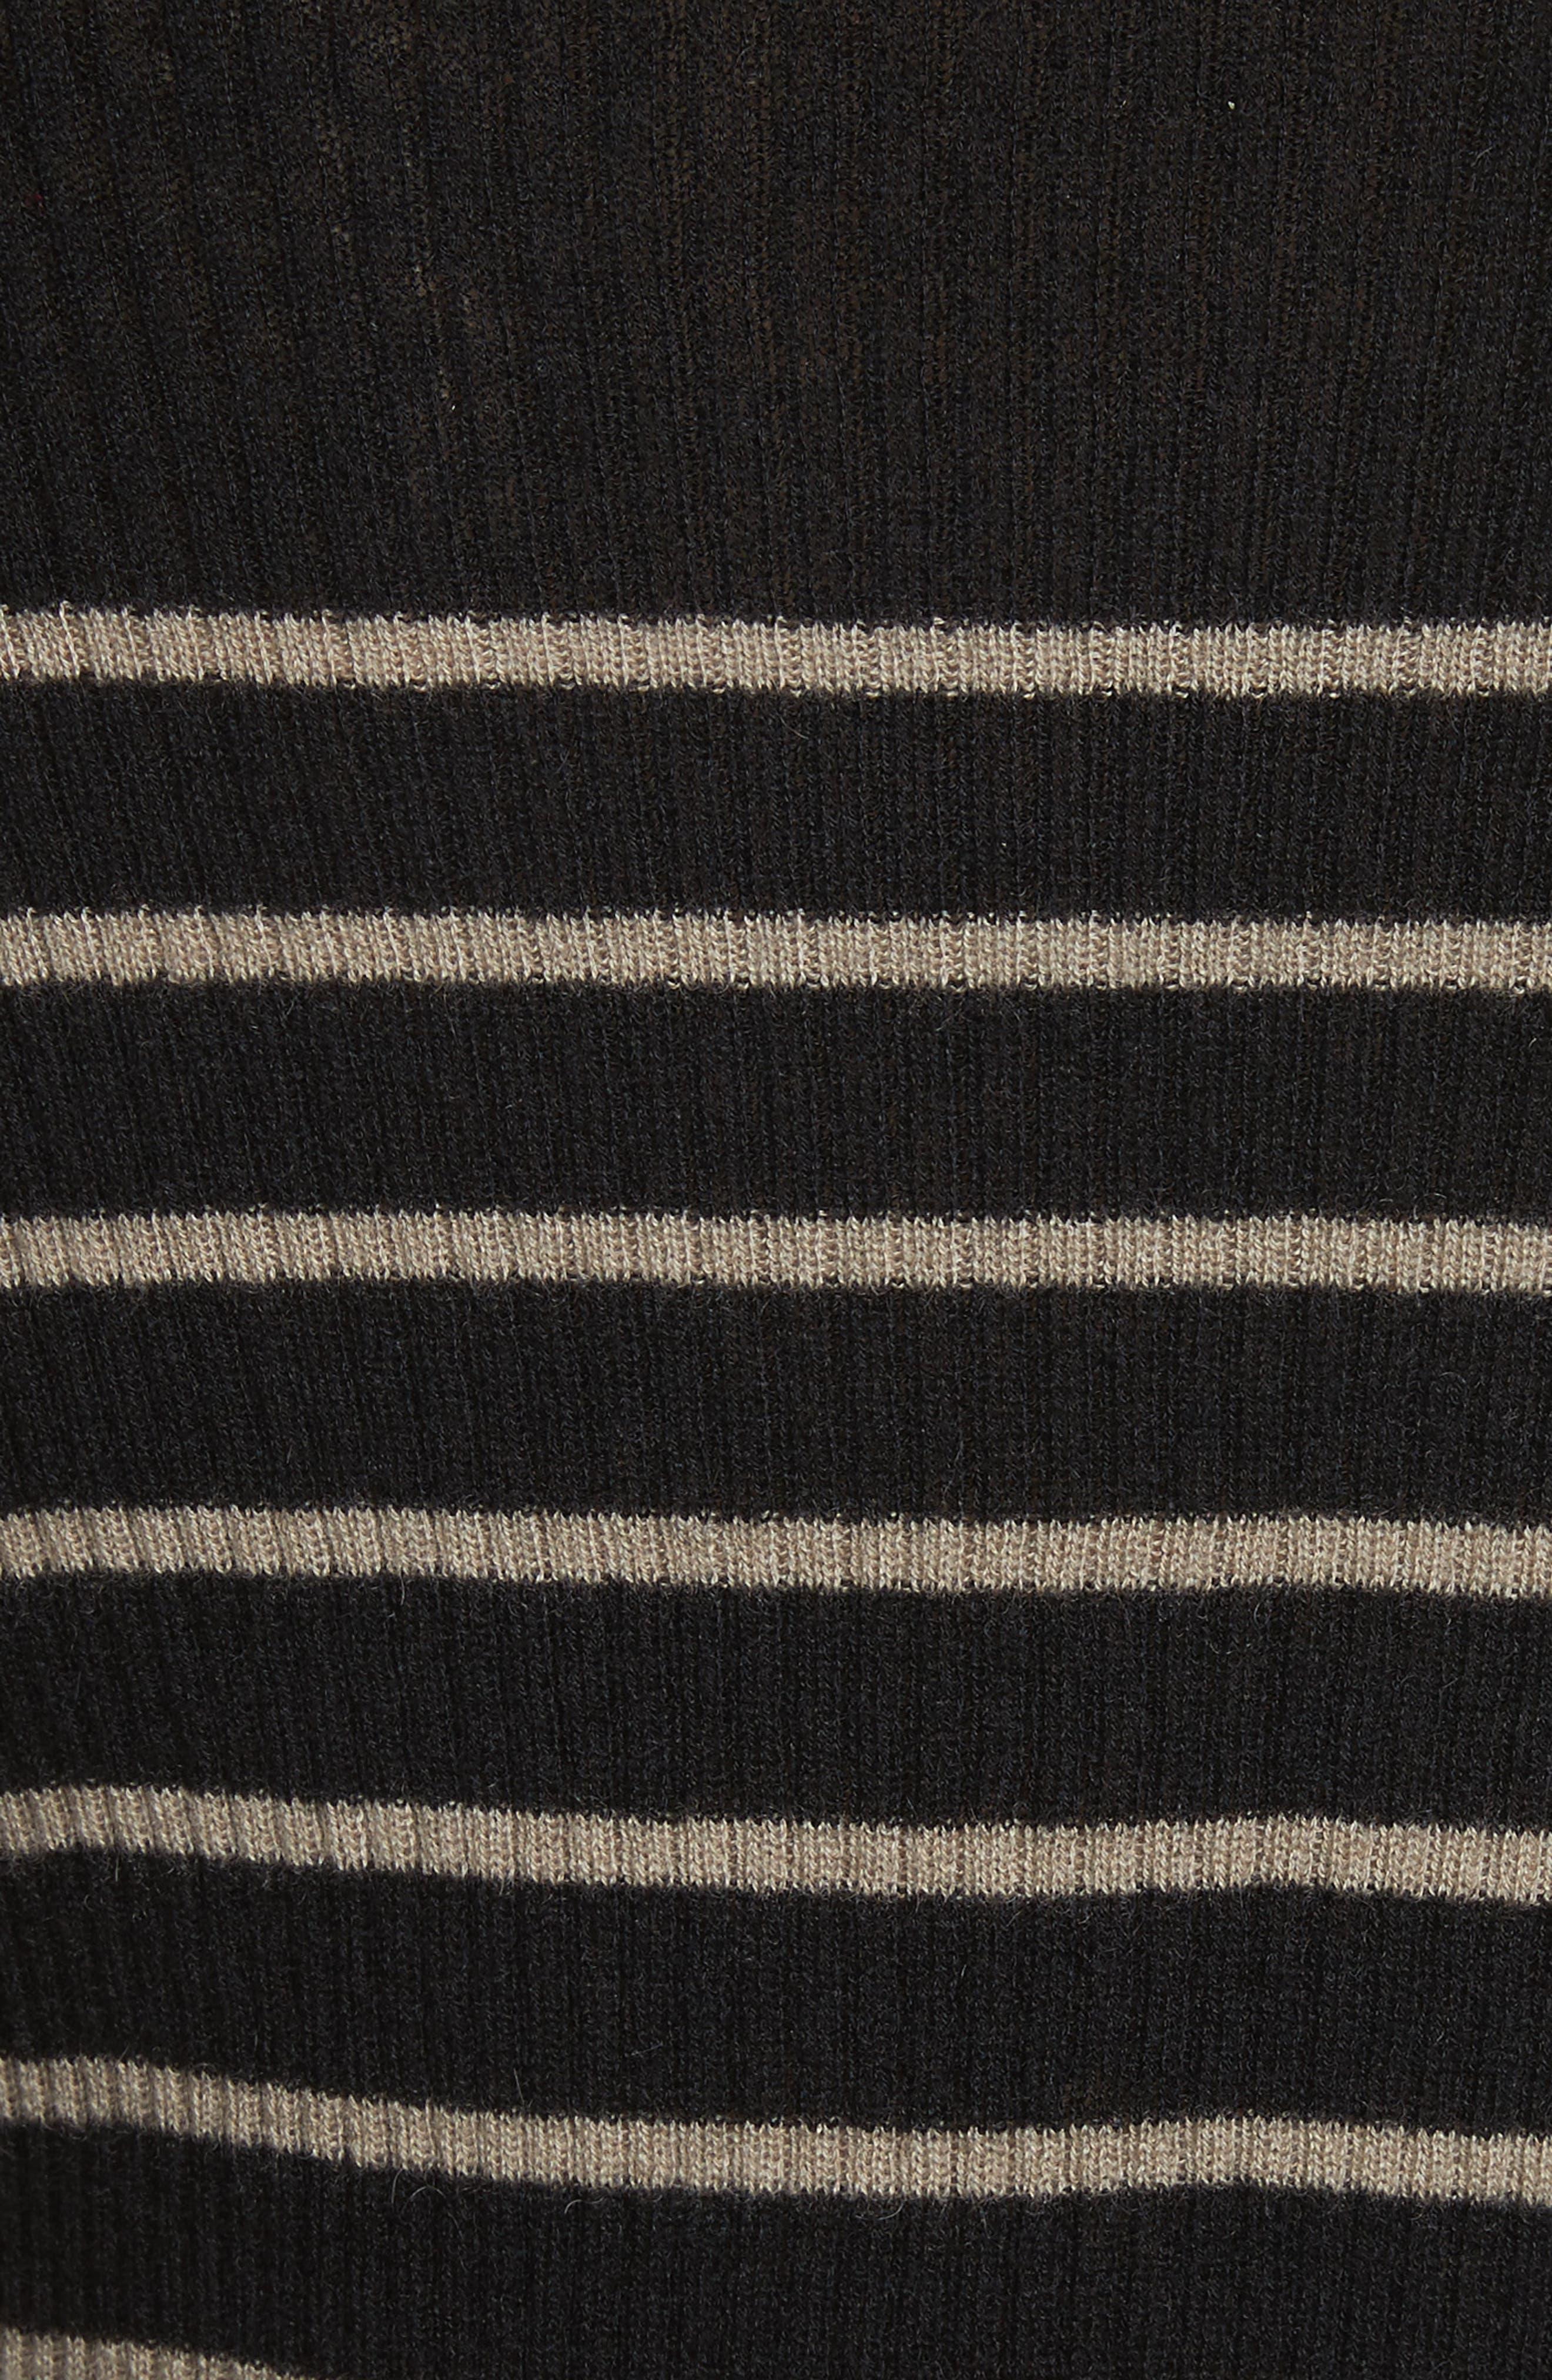 Stripe Ribbed Cashmere Sweater,                             Alternate thumbnail 5, color,                             Black/ Pebble Taupe